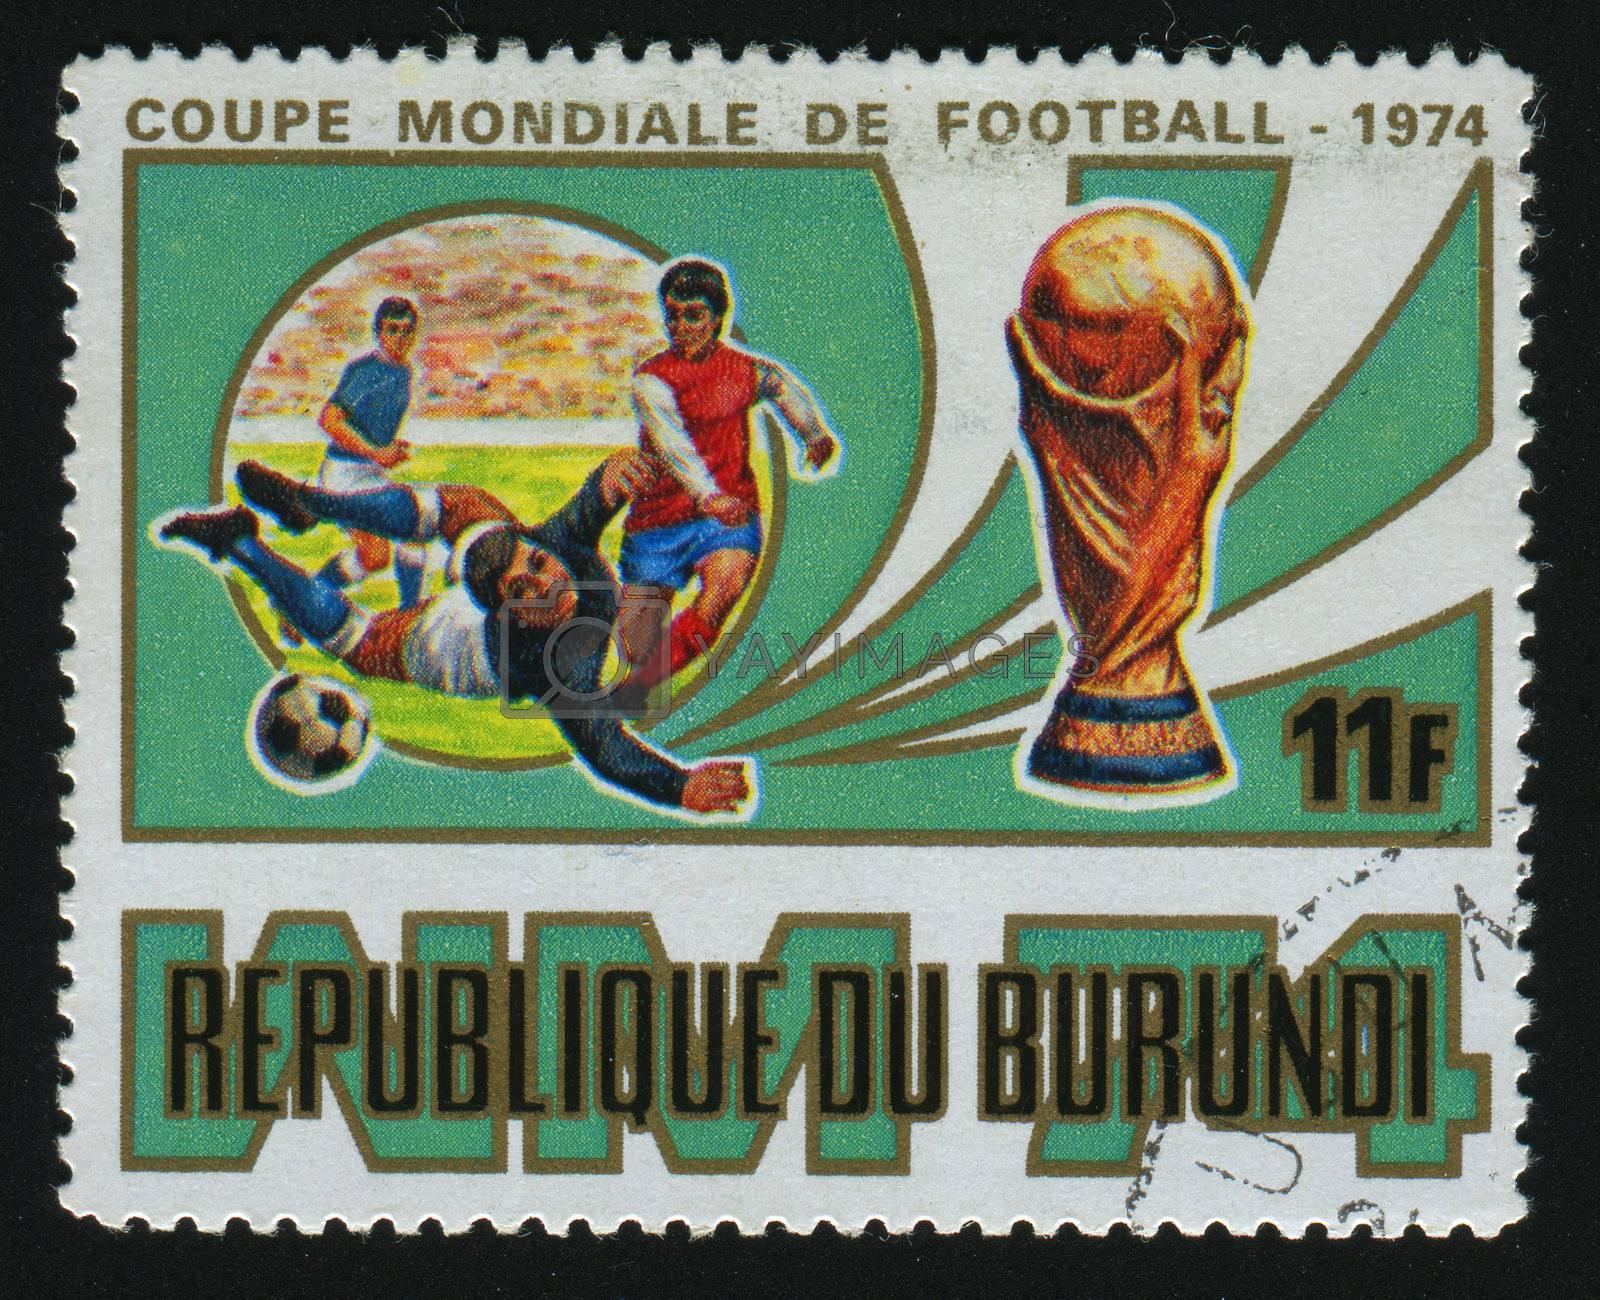 BURUNDI - CIRCA 1974: stamp printed by Burundi, shows soccer players and ball, circa 1974.